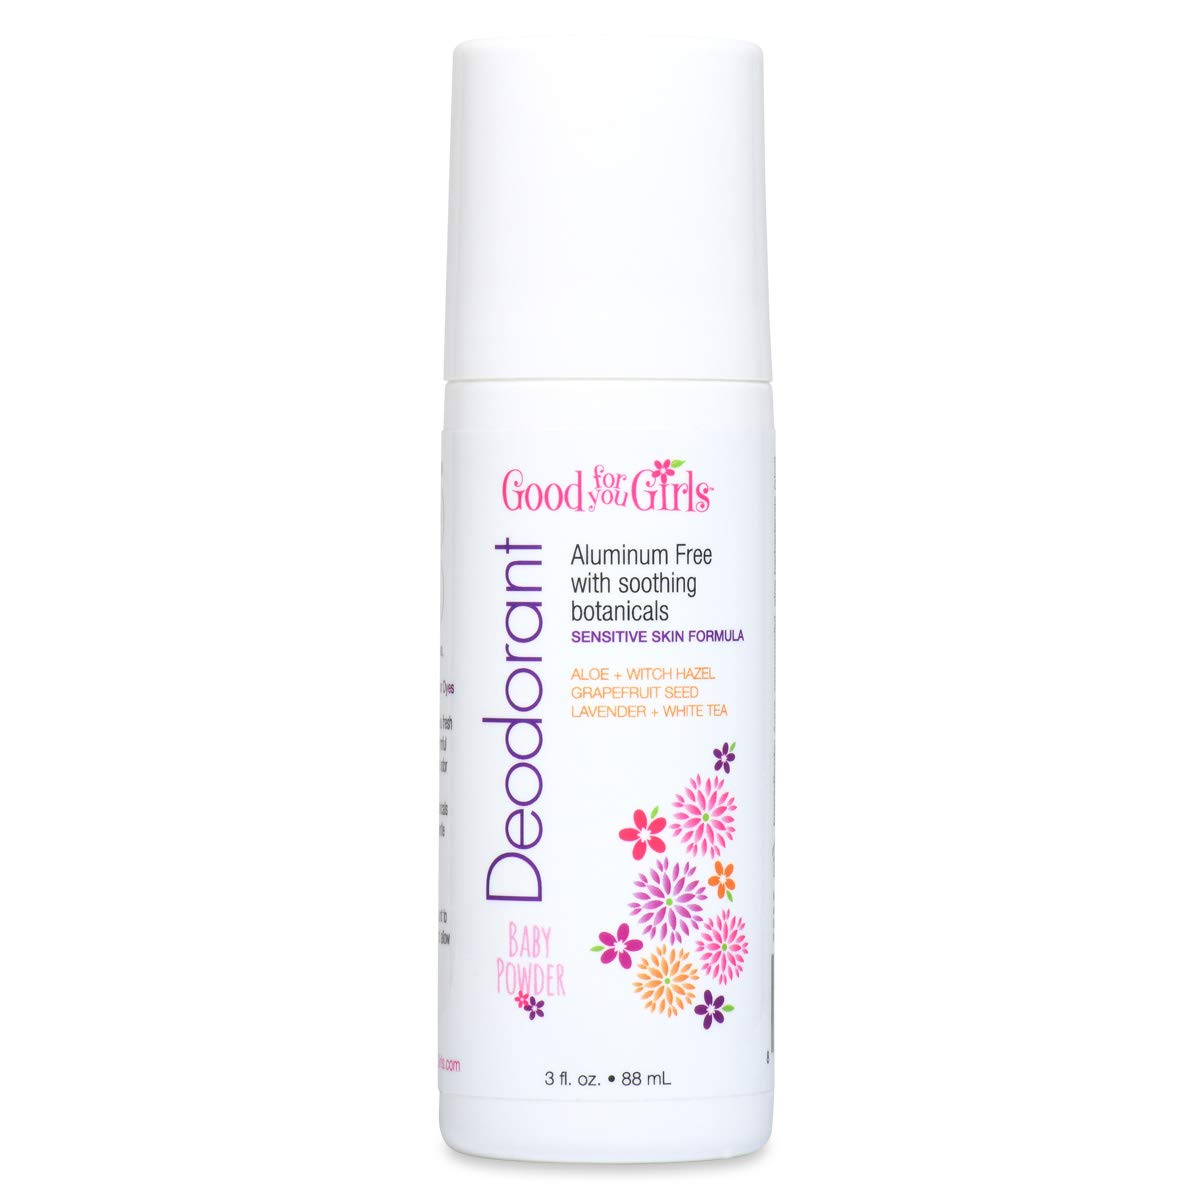 Good For You Girls Aluminum Free Natural Deodorant (3 fl. oz) Kids, Teens, Tween, Vegan (Baby Powder Scent)